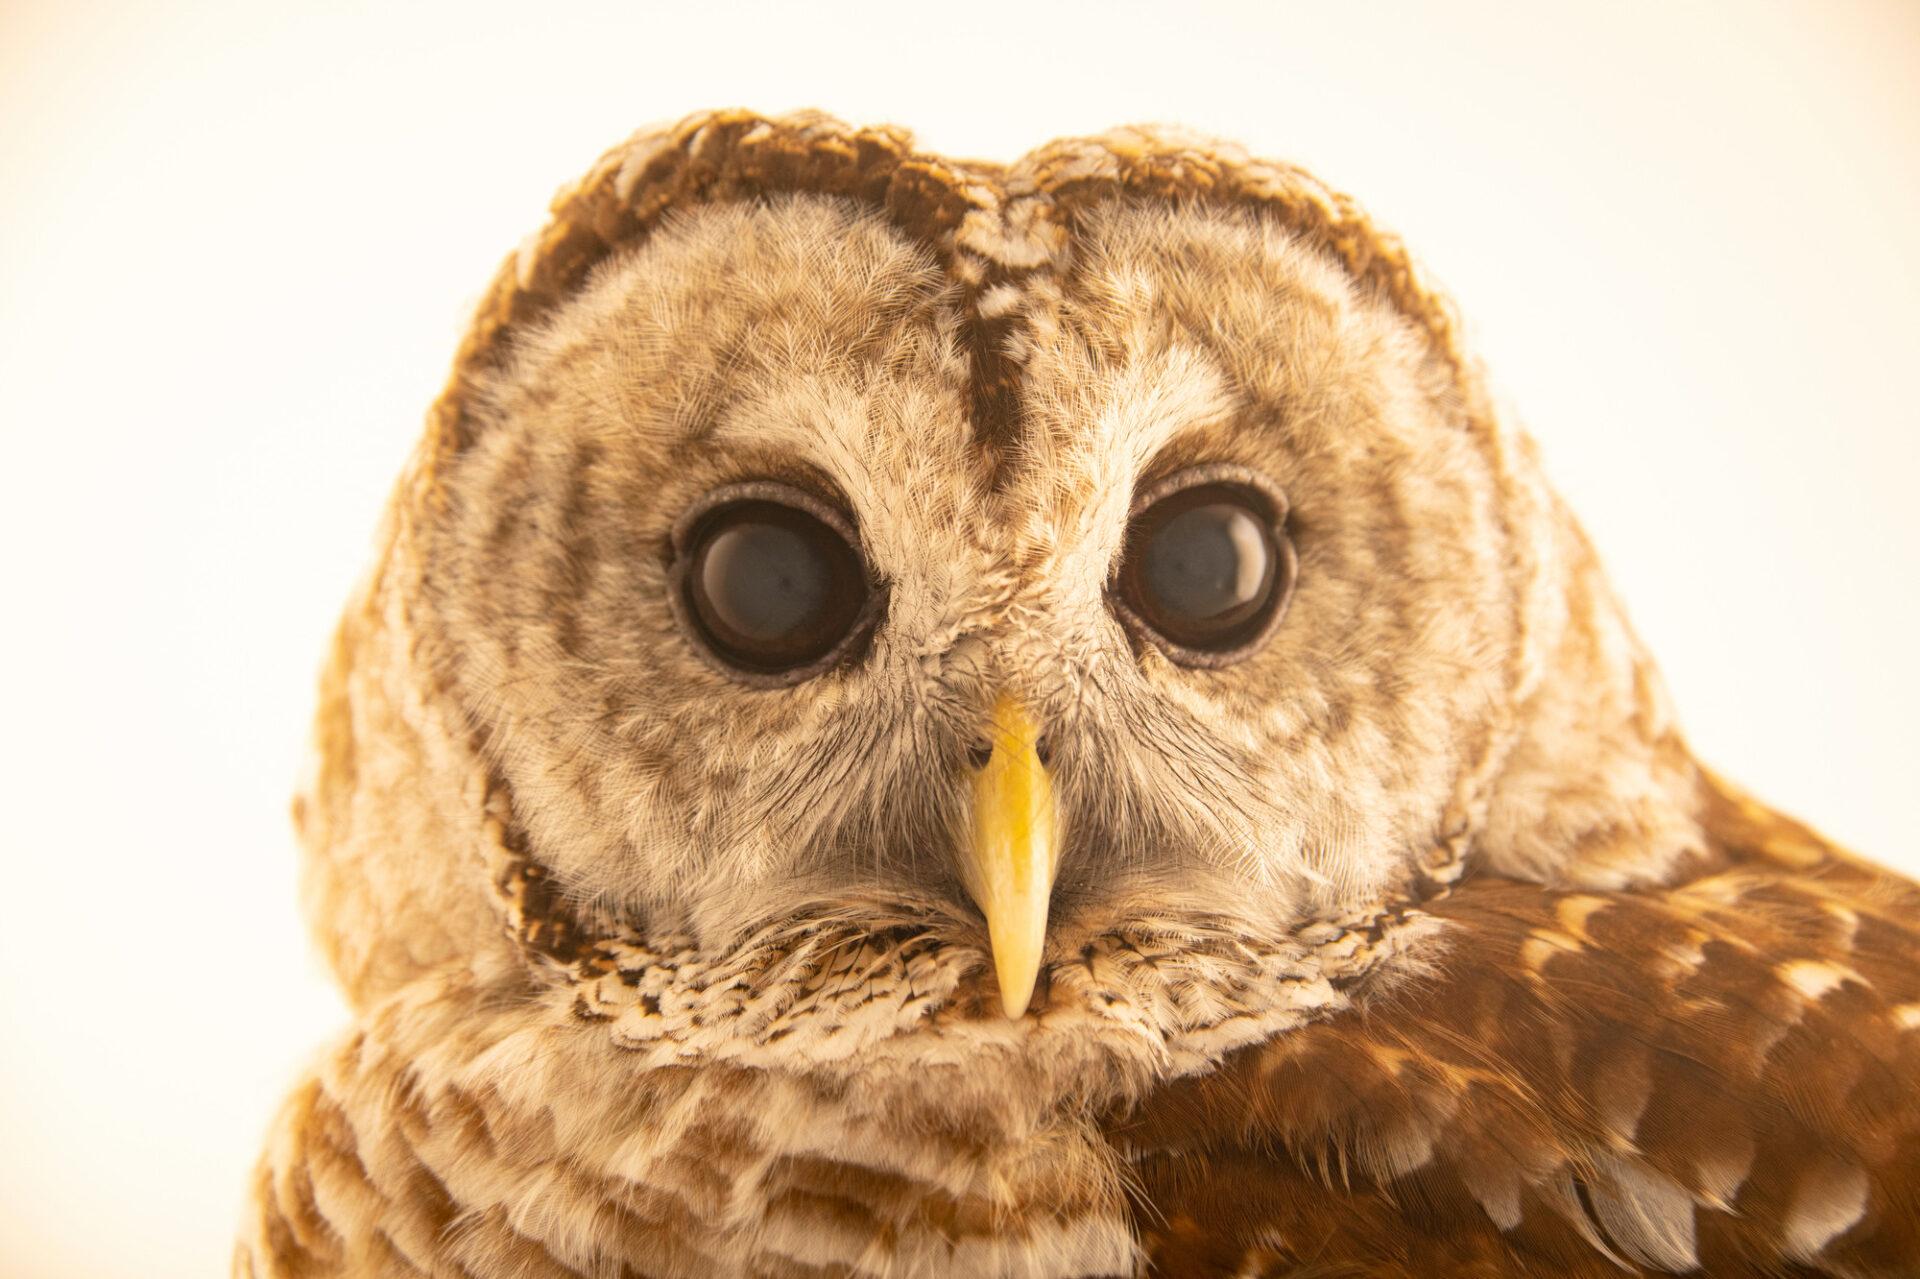 Photo: A Florida barred owl (Strix varia georgica) at the Jacksonville Zoo and Gardens, Jacksonville, Florida.